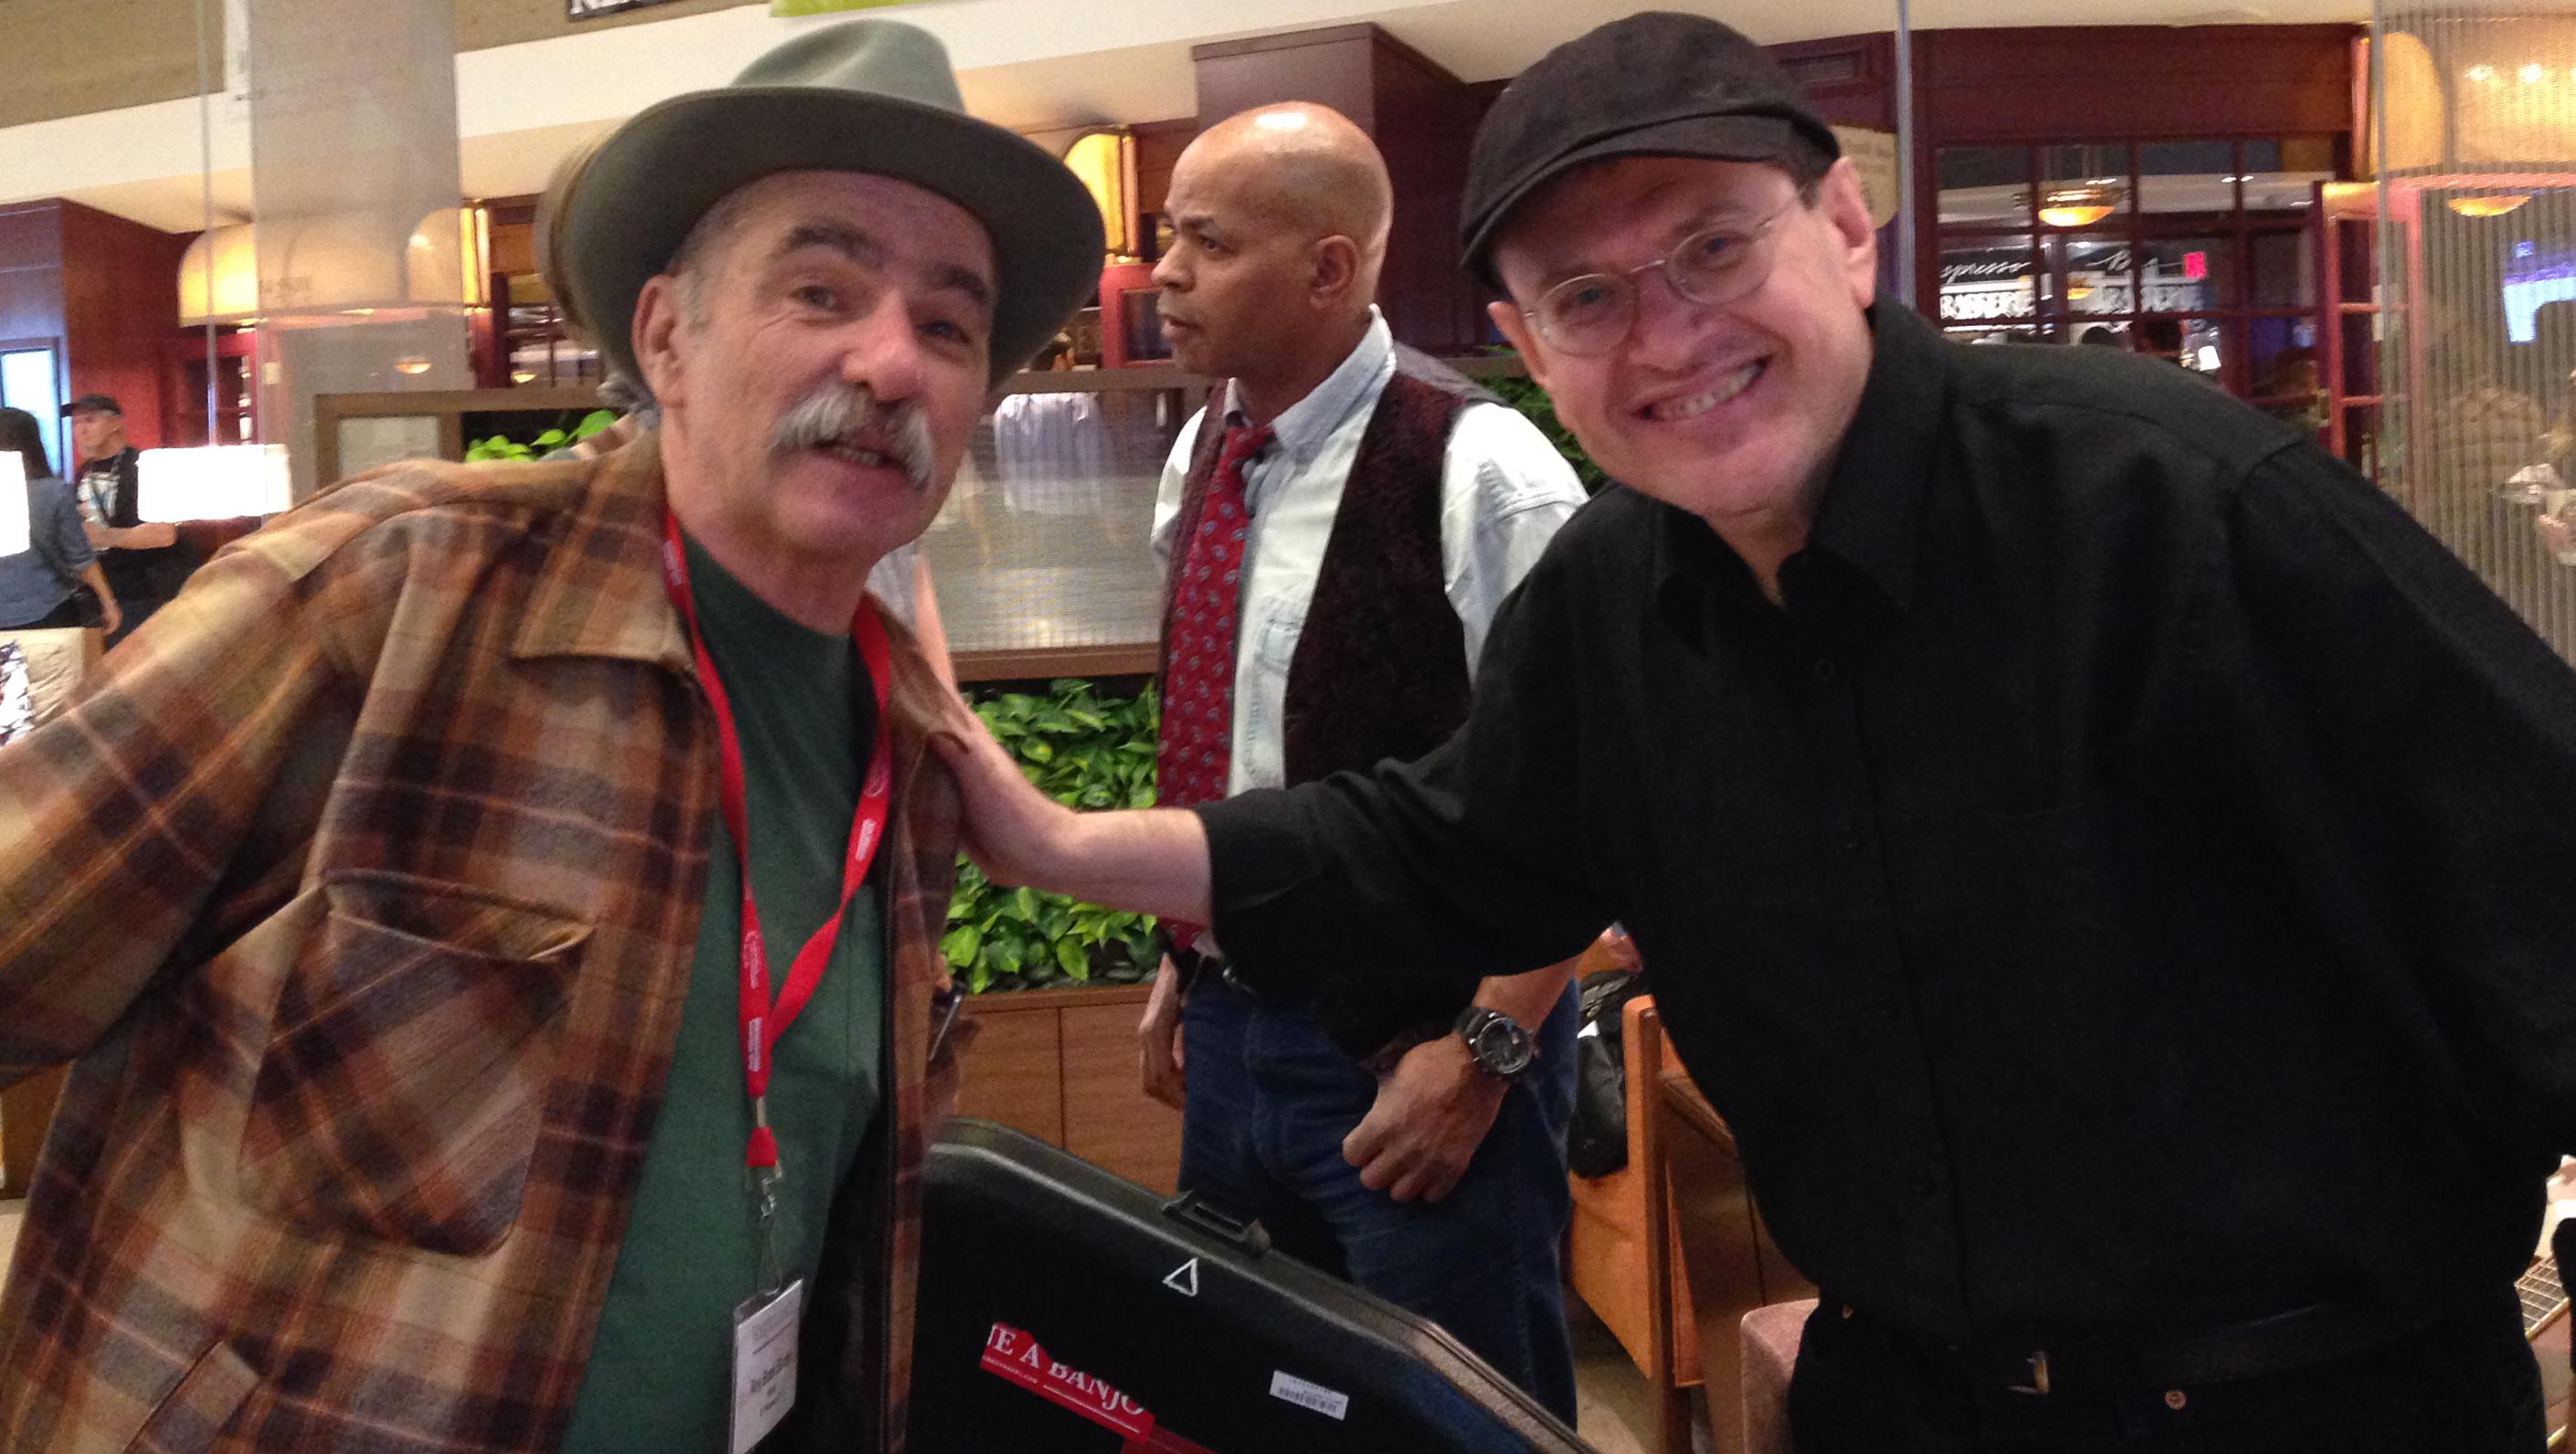 Roy Book Binder & Fabrizio Poggi Folk Alliance 2014 Kansas City